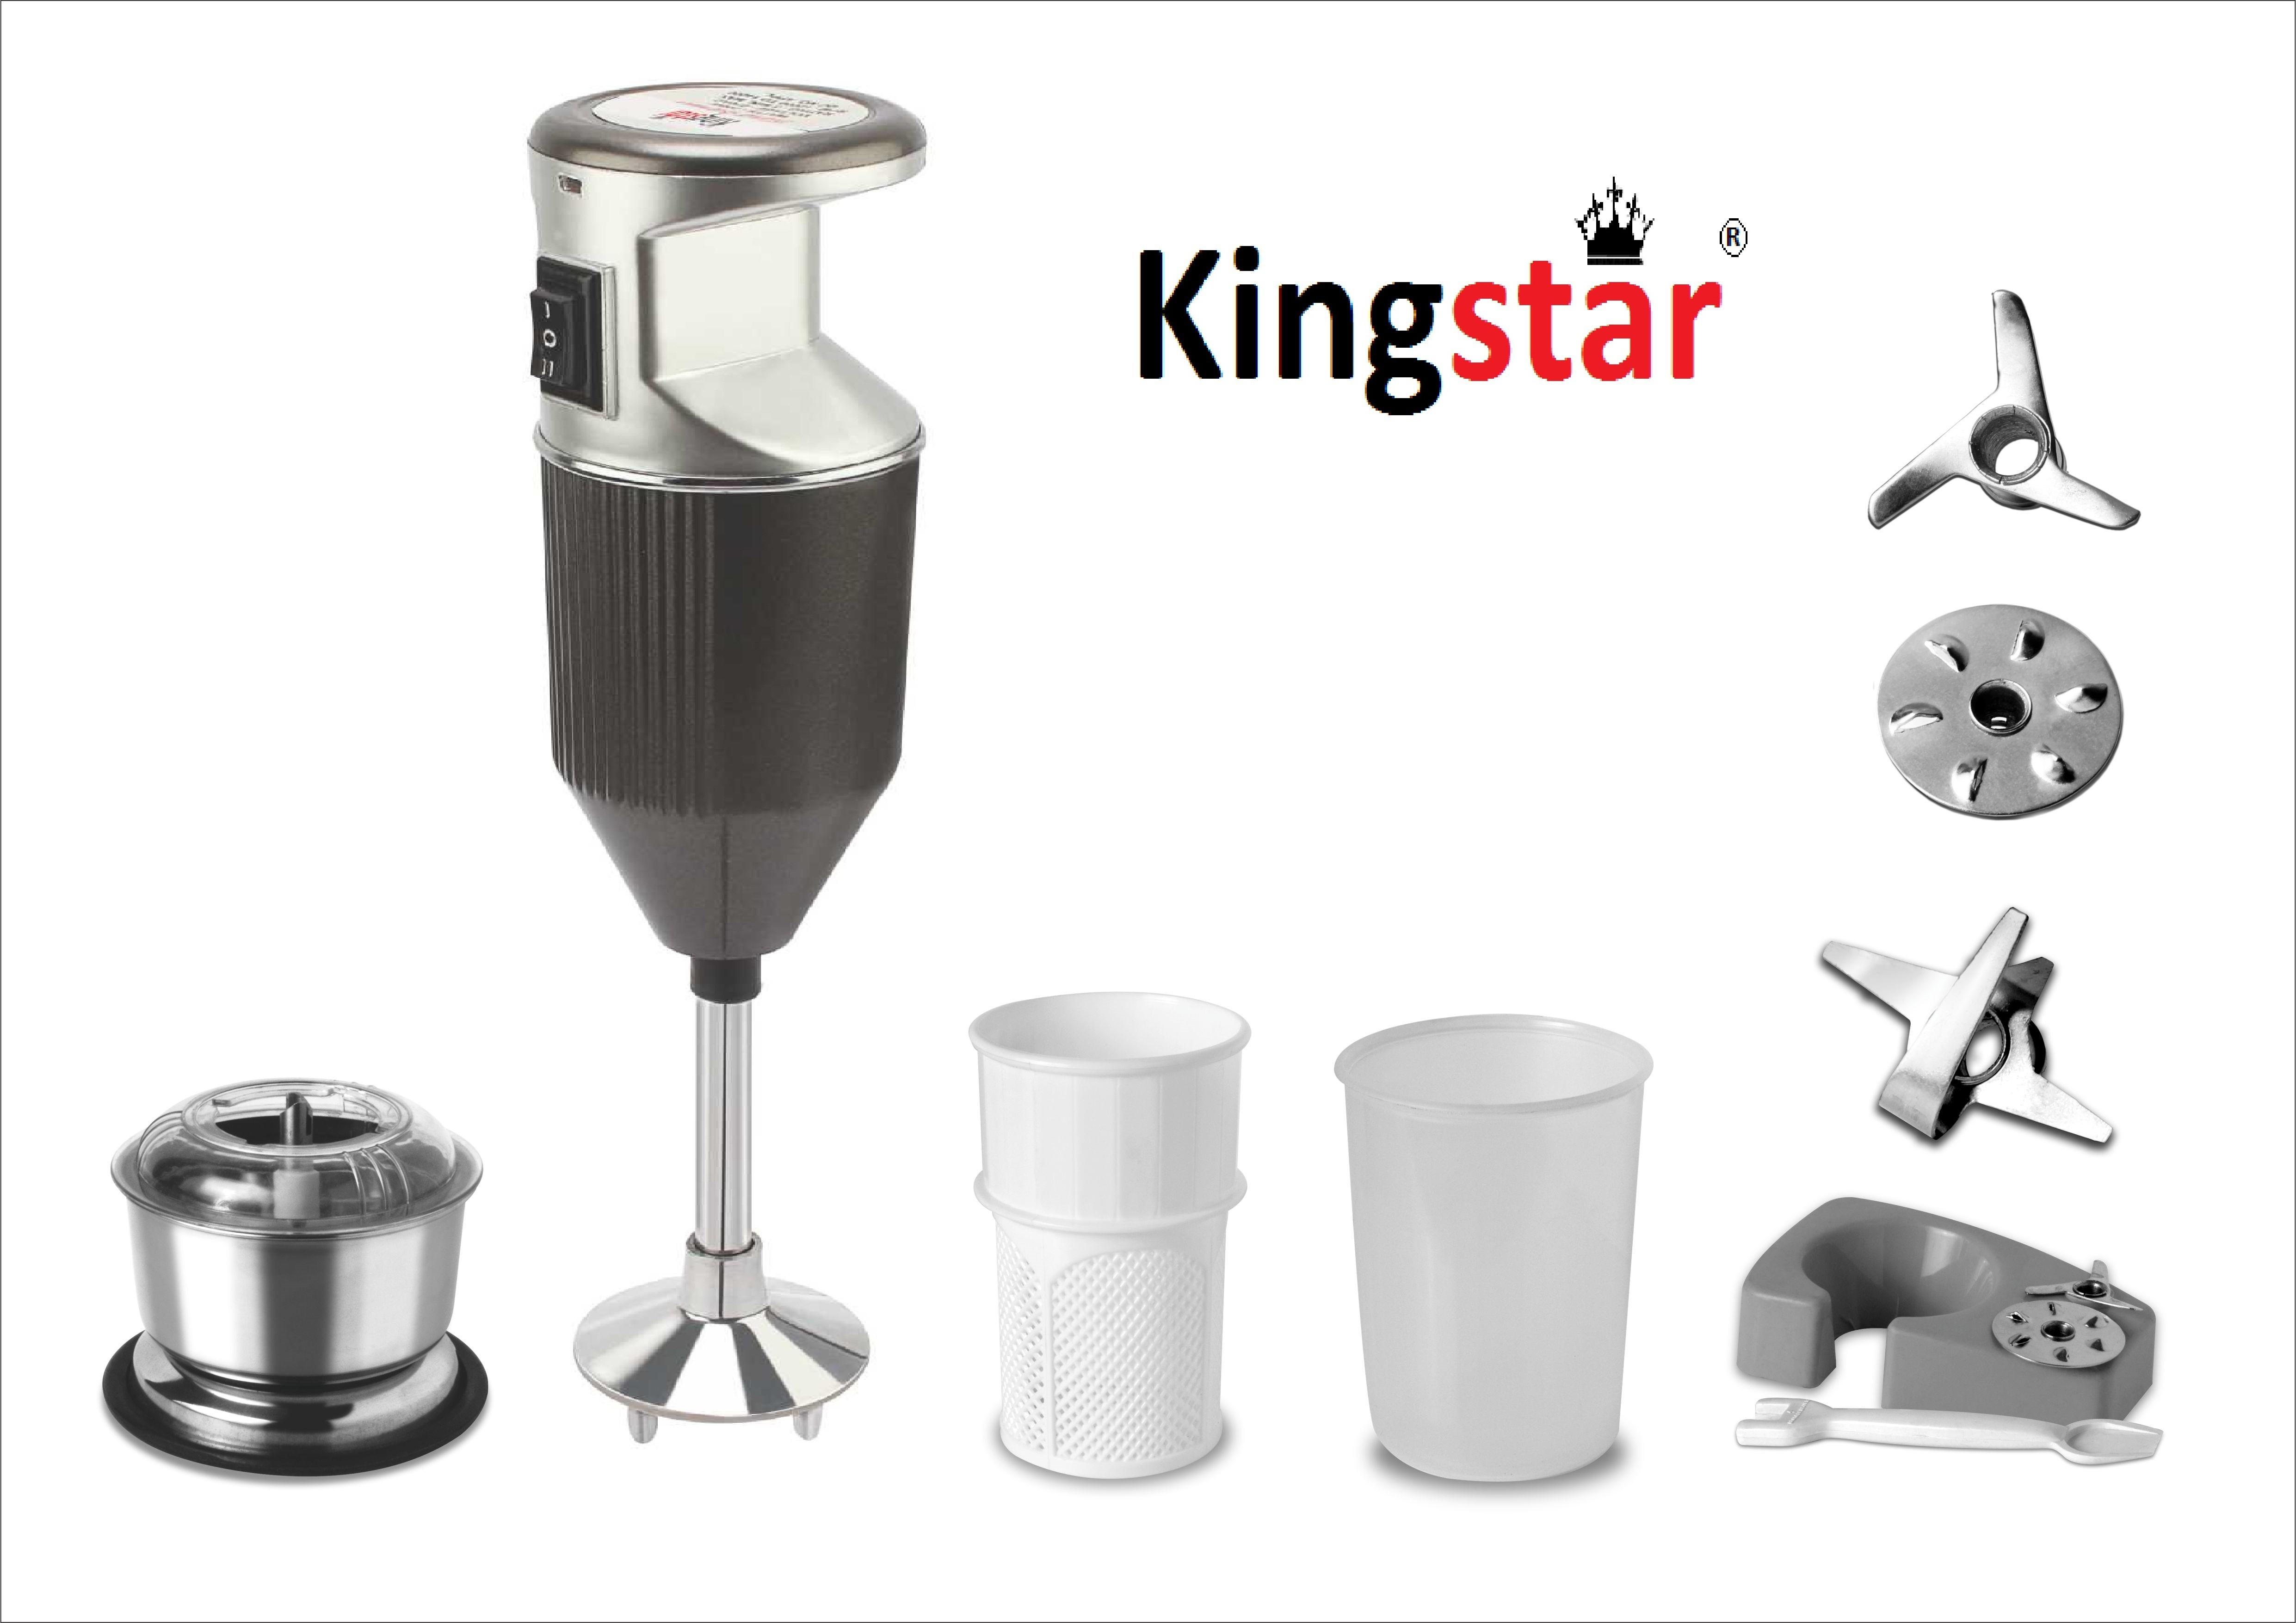 Kingstar Bmw Gery 200 W Hand Blender(Grey)